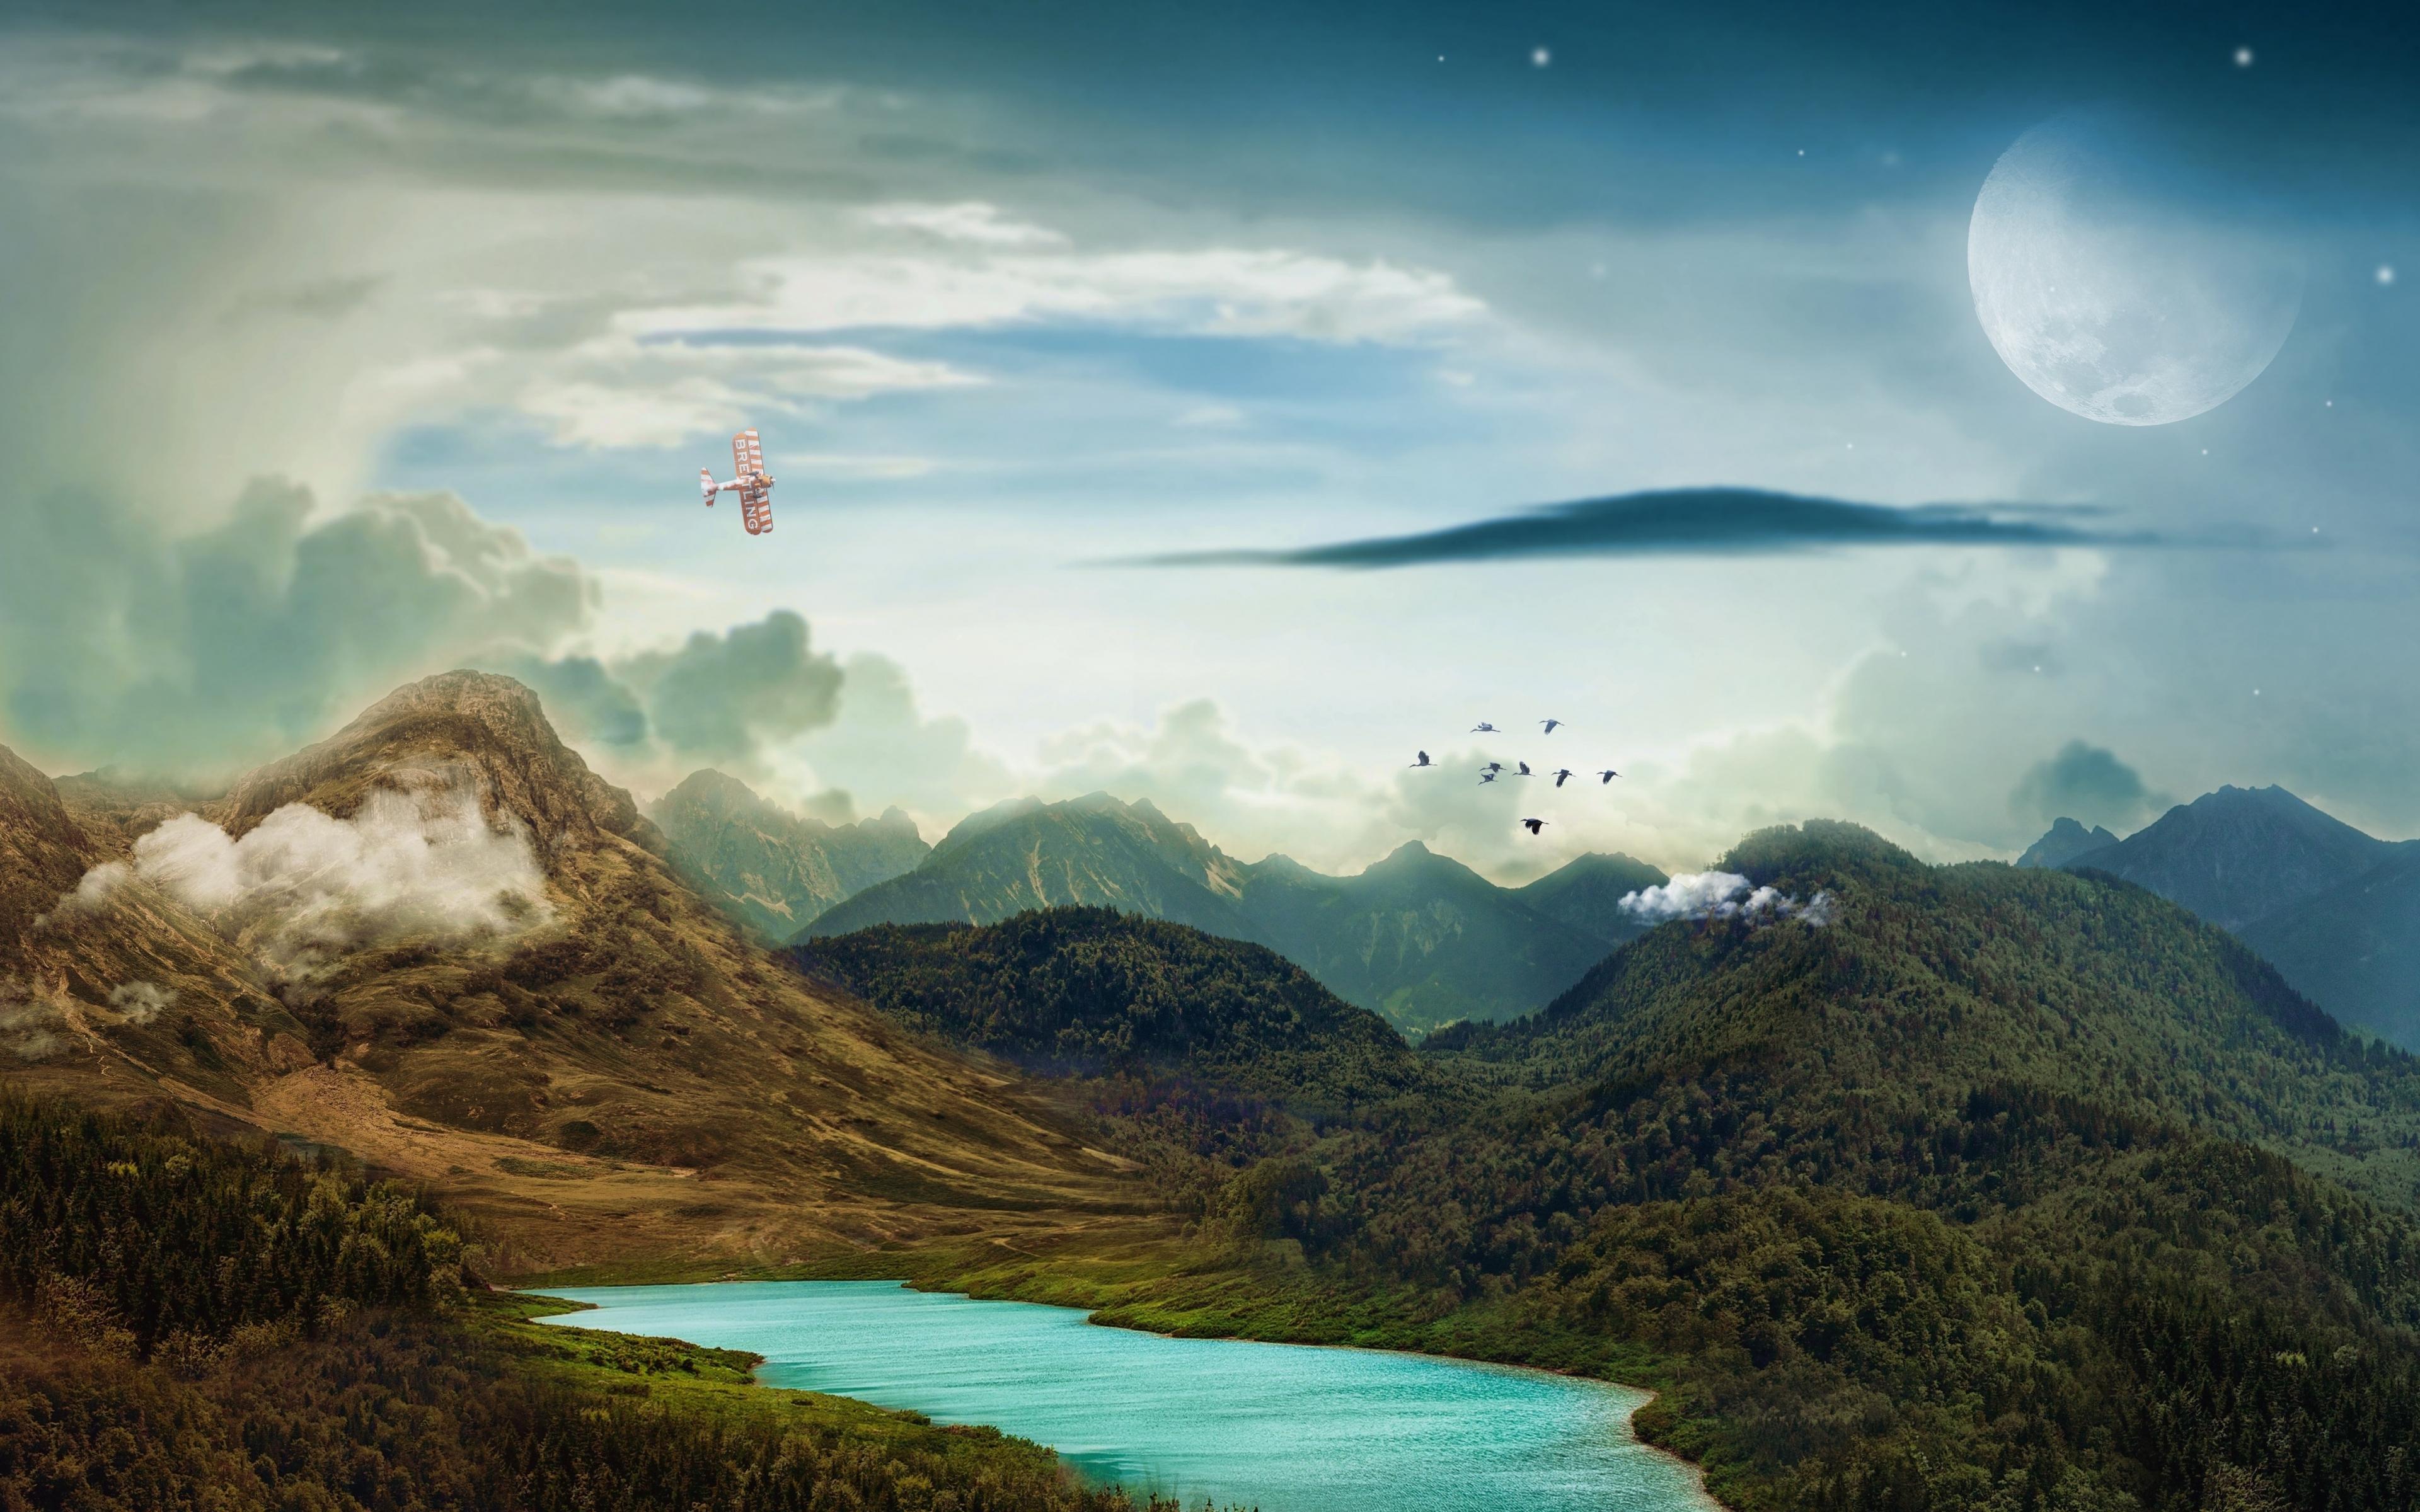 Download 3840x2400 Wallpaper Landscape, Mountains, Moon